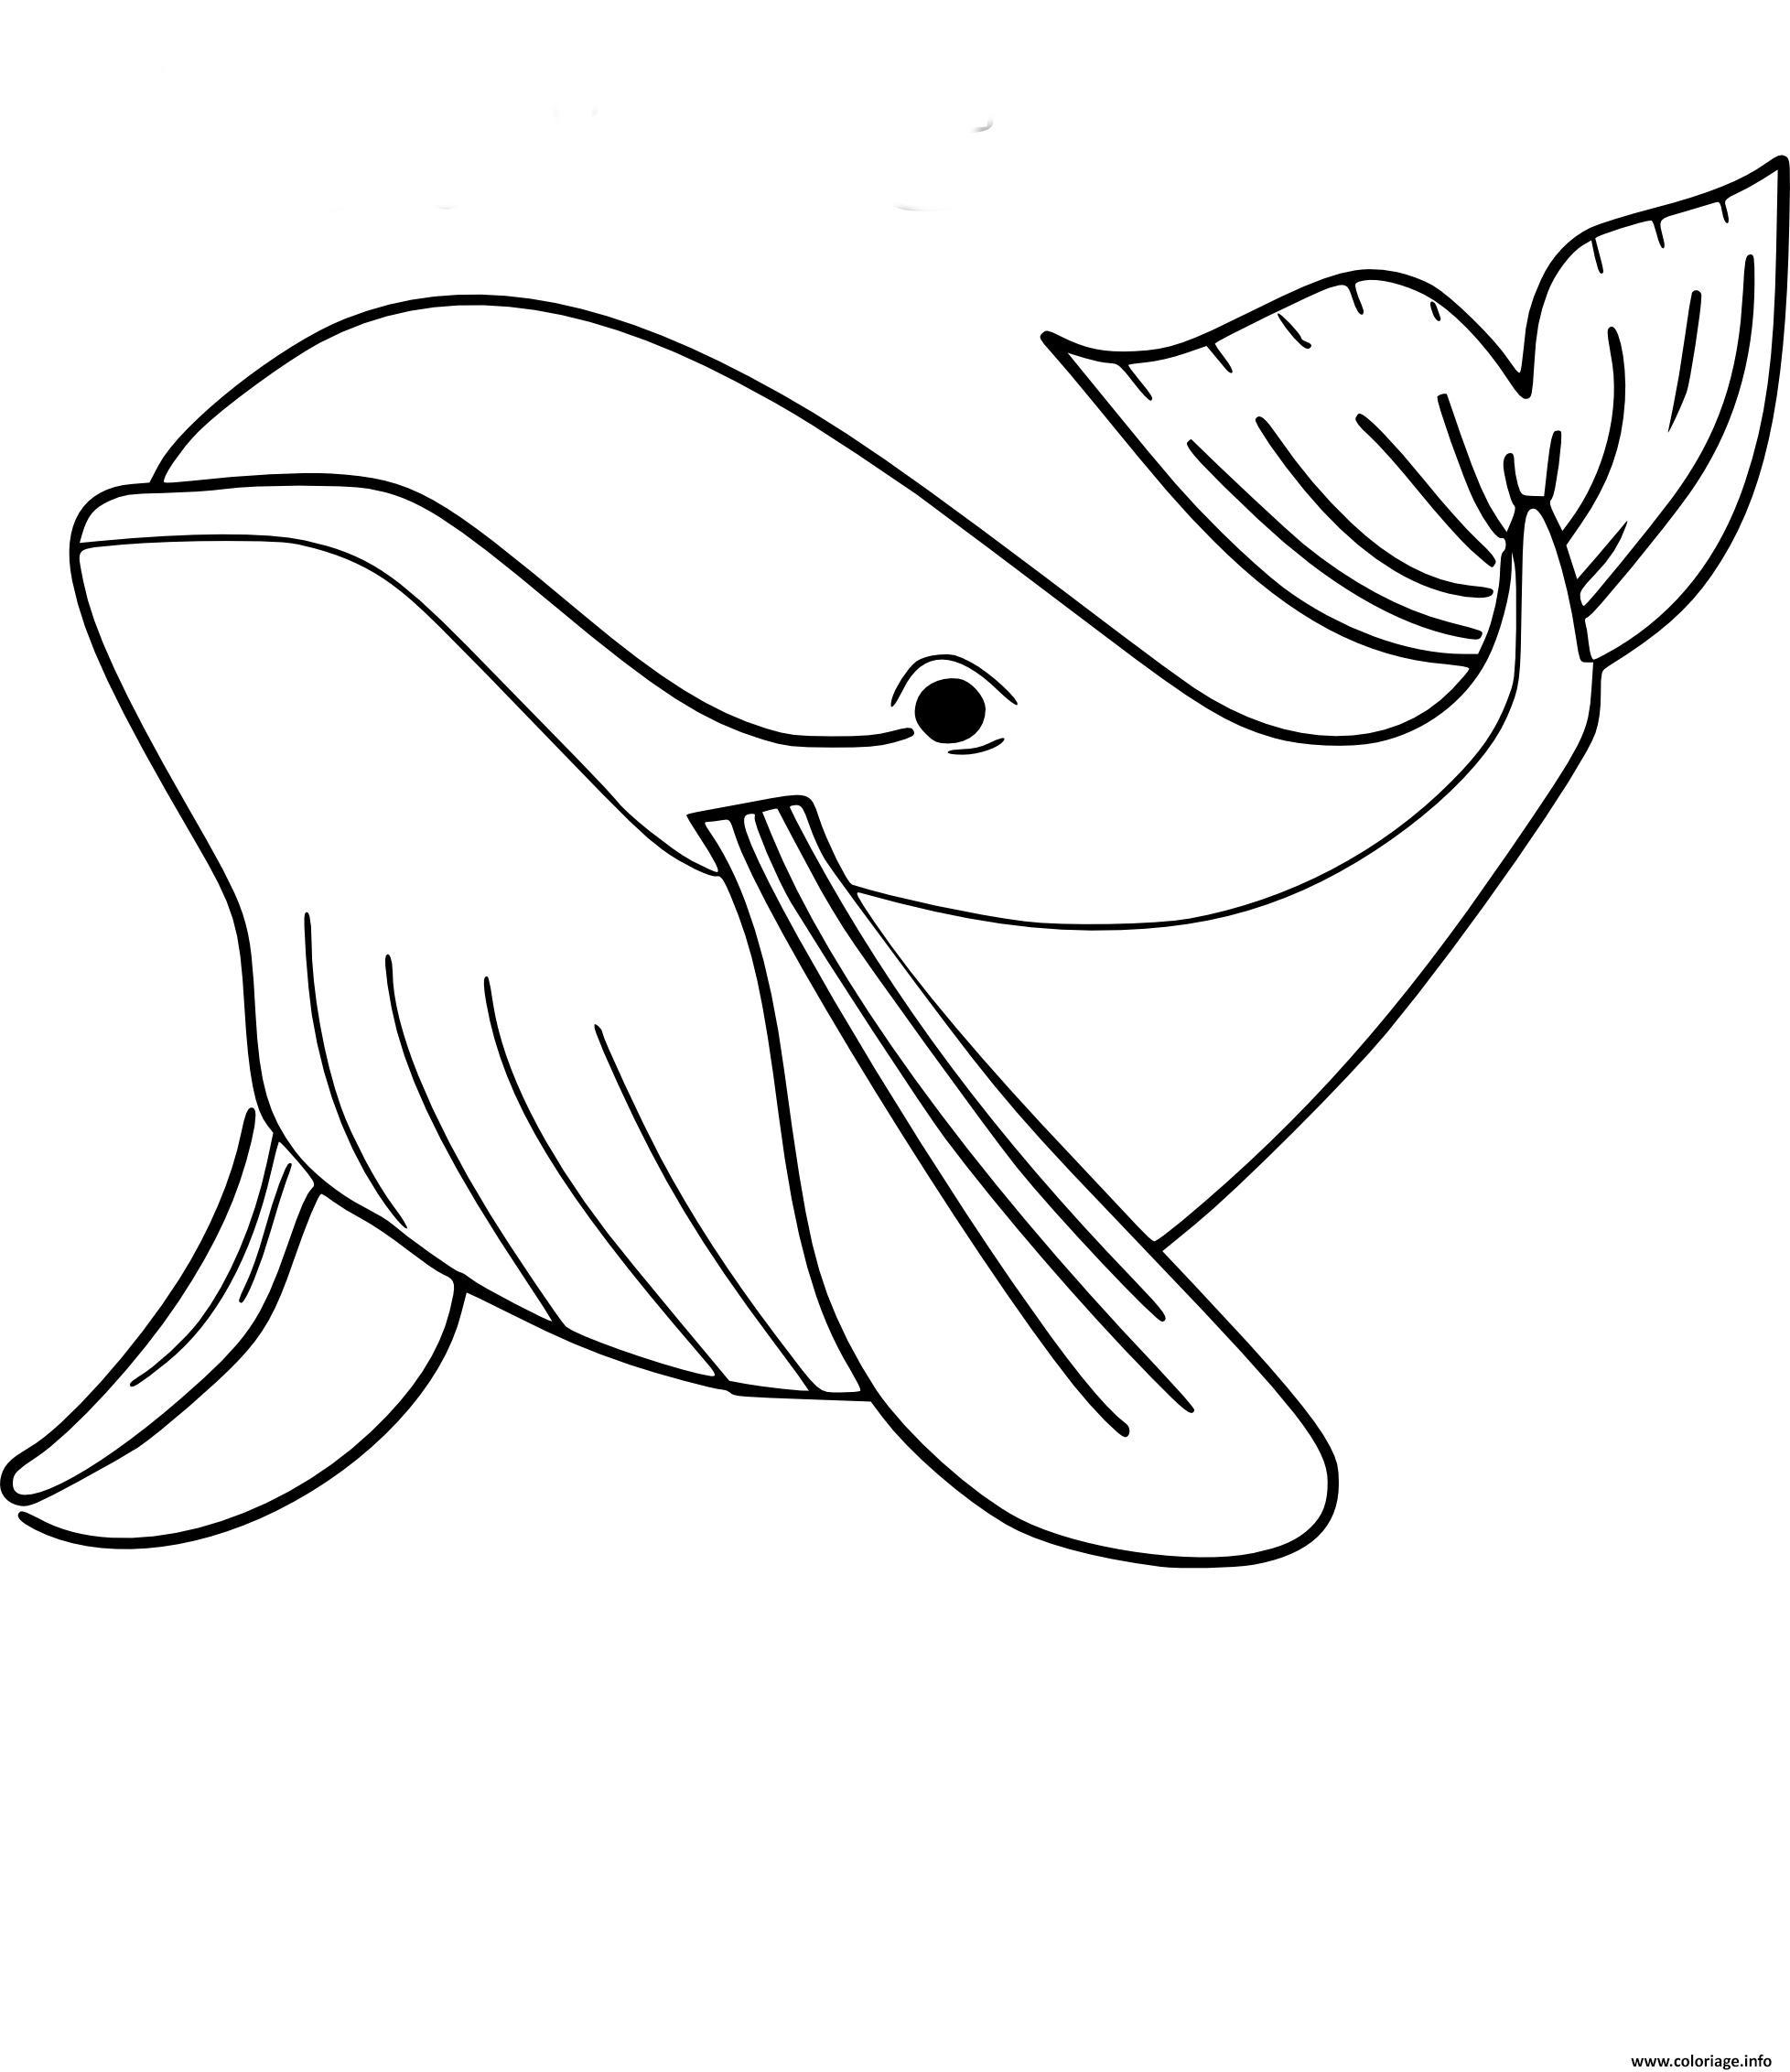 Coloriage Baleine Mandala.Coloriage Baleine Gratuit Dessin